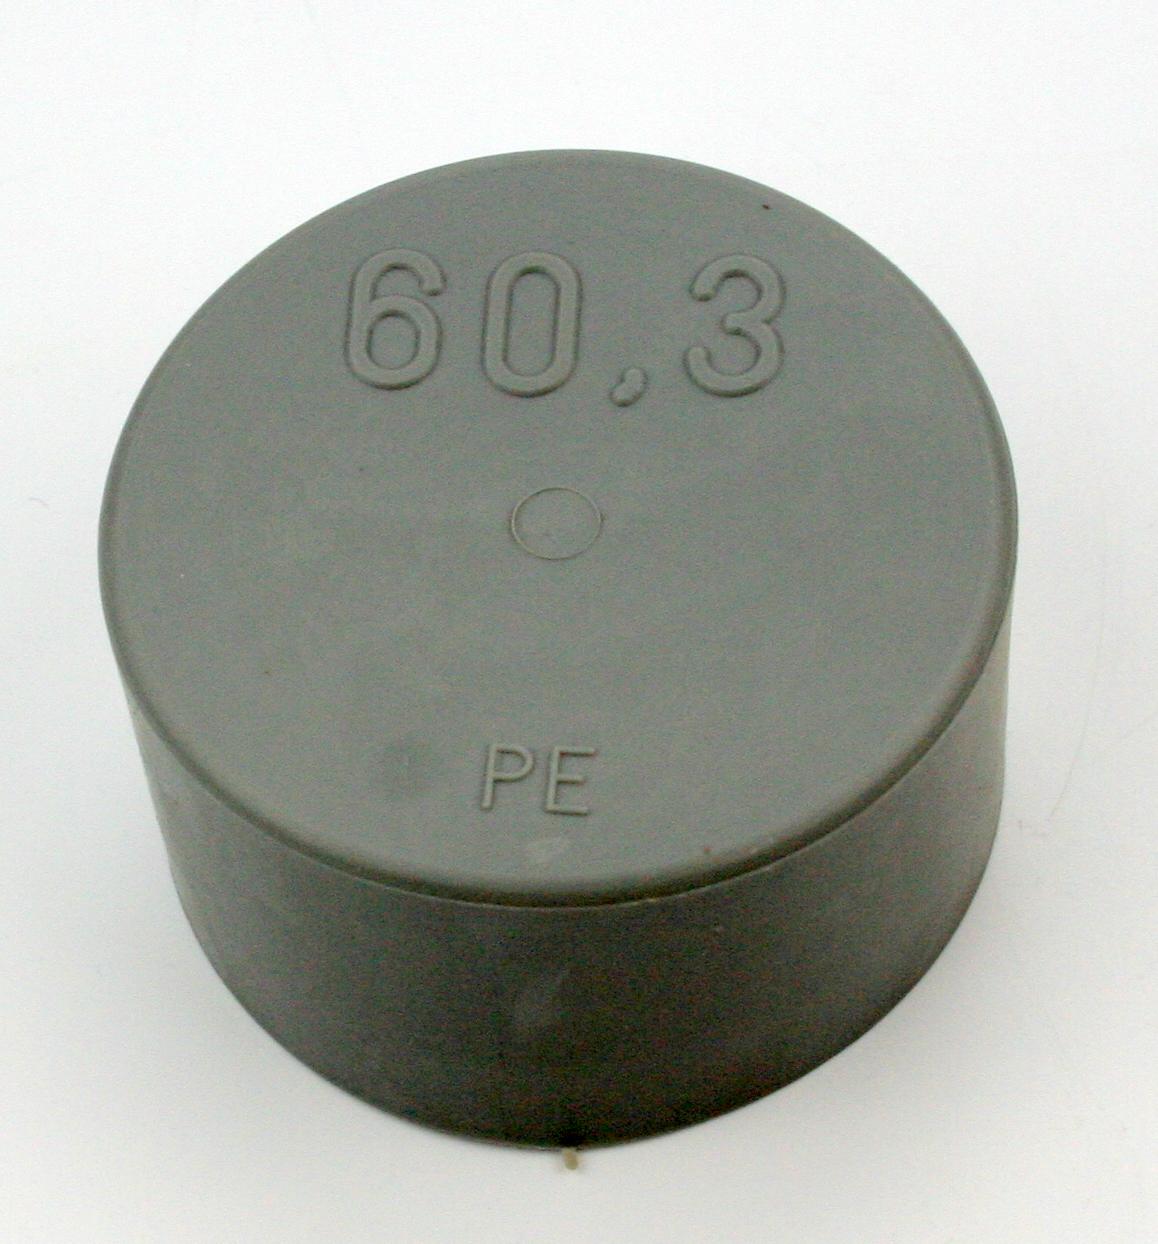 MAKA 60, Mastkappe für Mast 60 mm